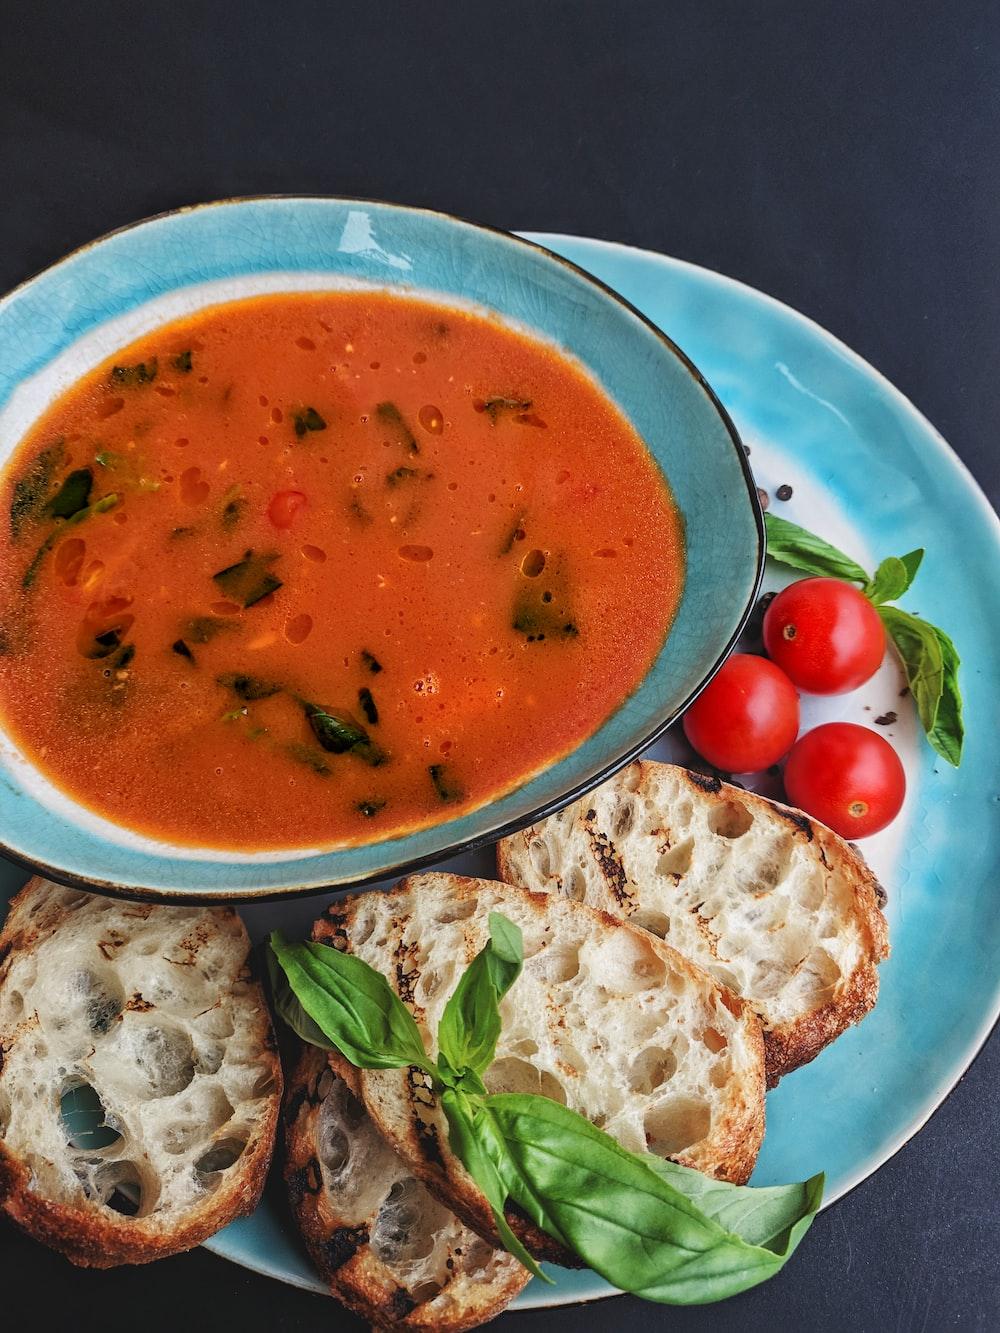 soup with sliced of vegetables on blue ceramic bowl